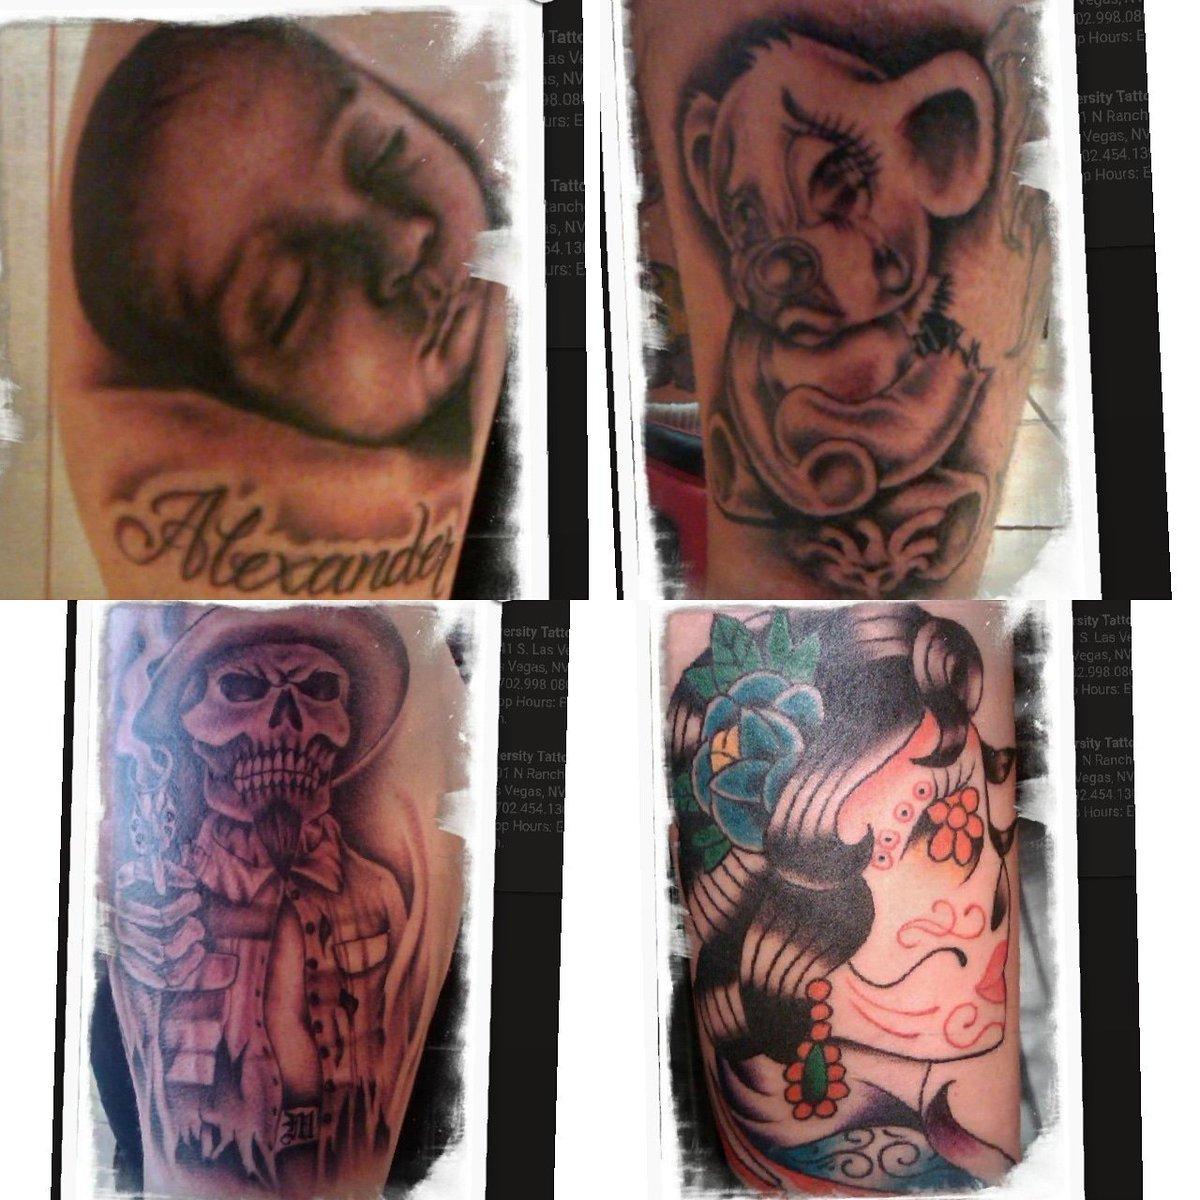 Diversity Tattoo Las Vegas